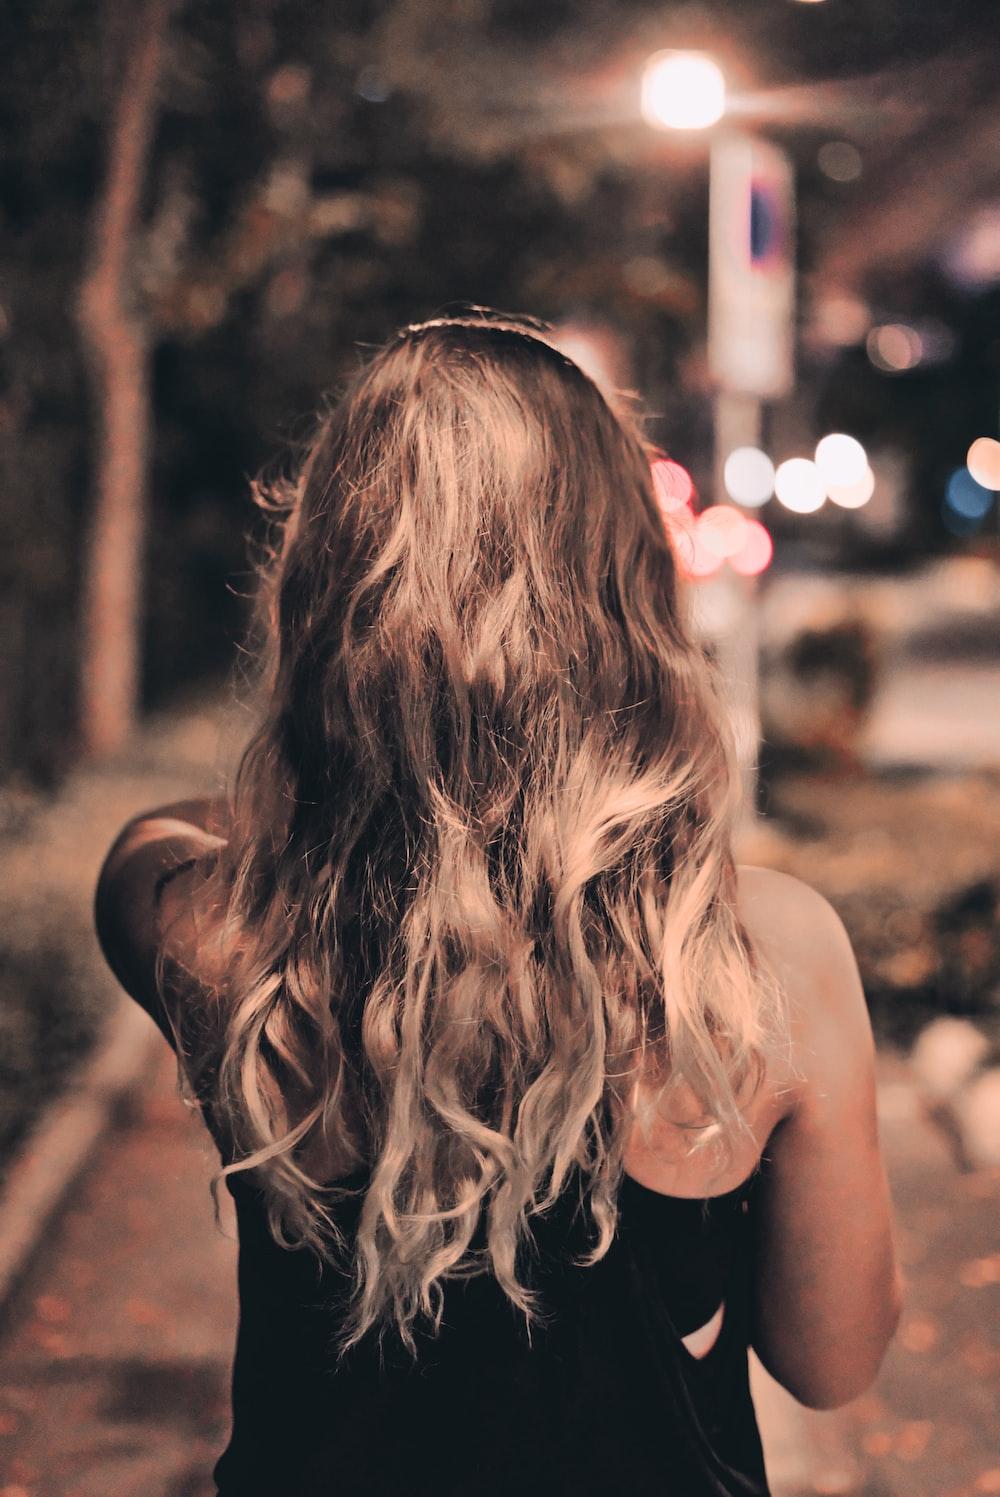 women's black sleeveless top close-up photography